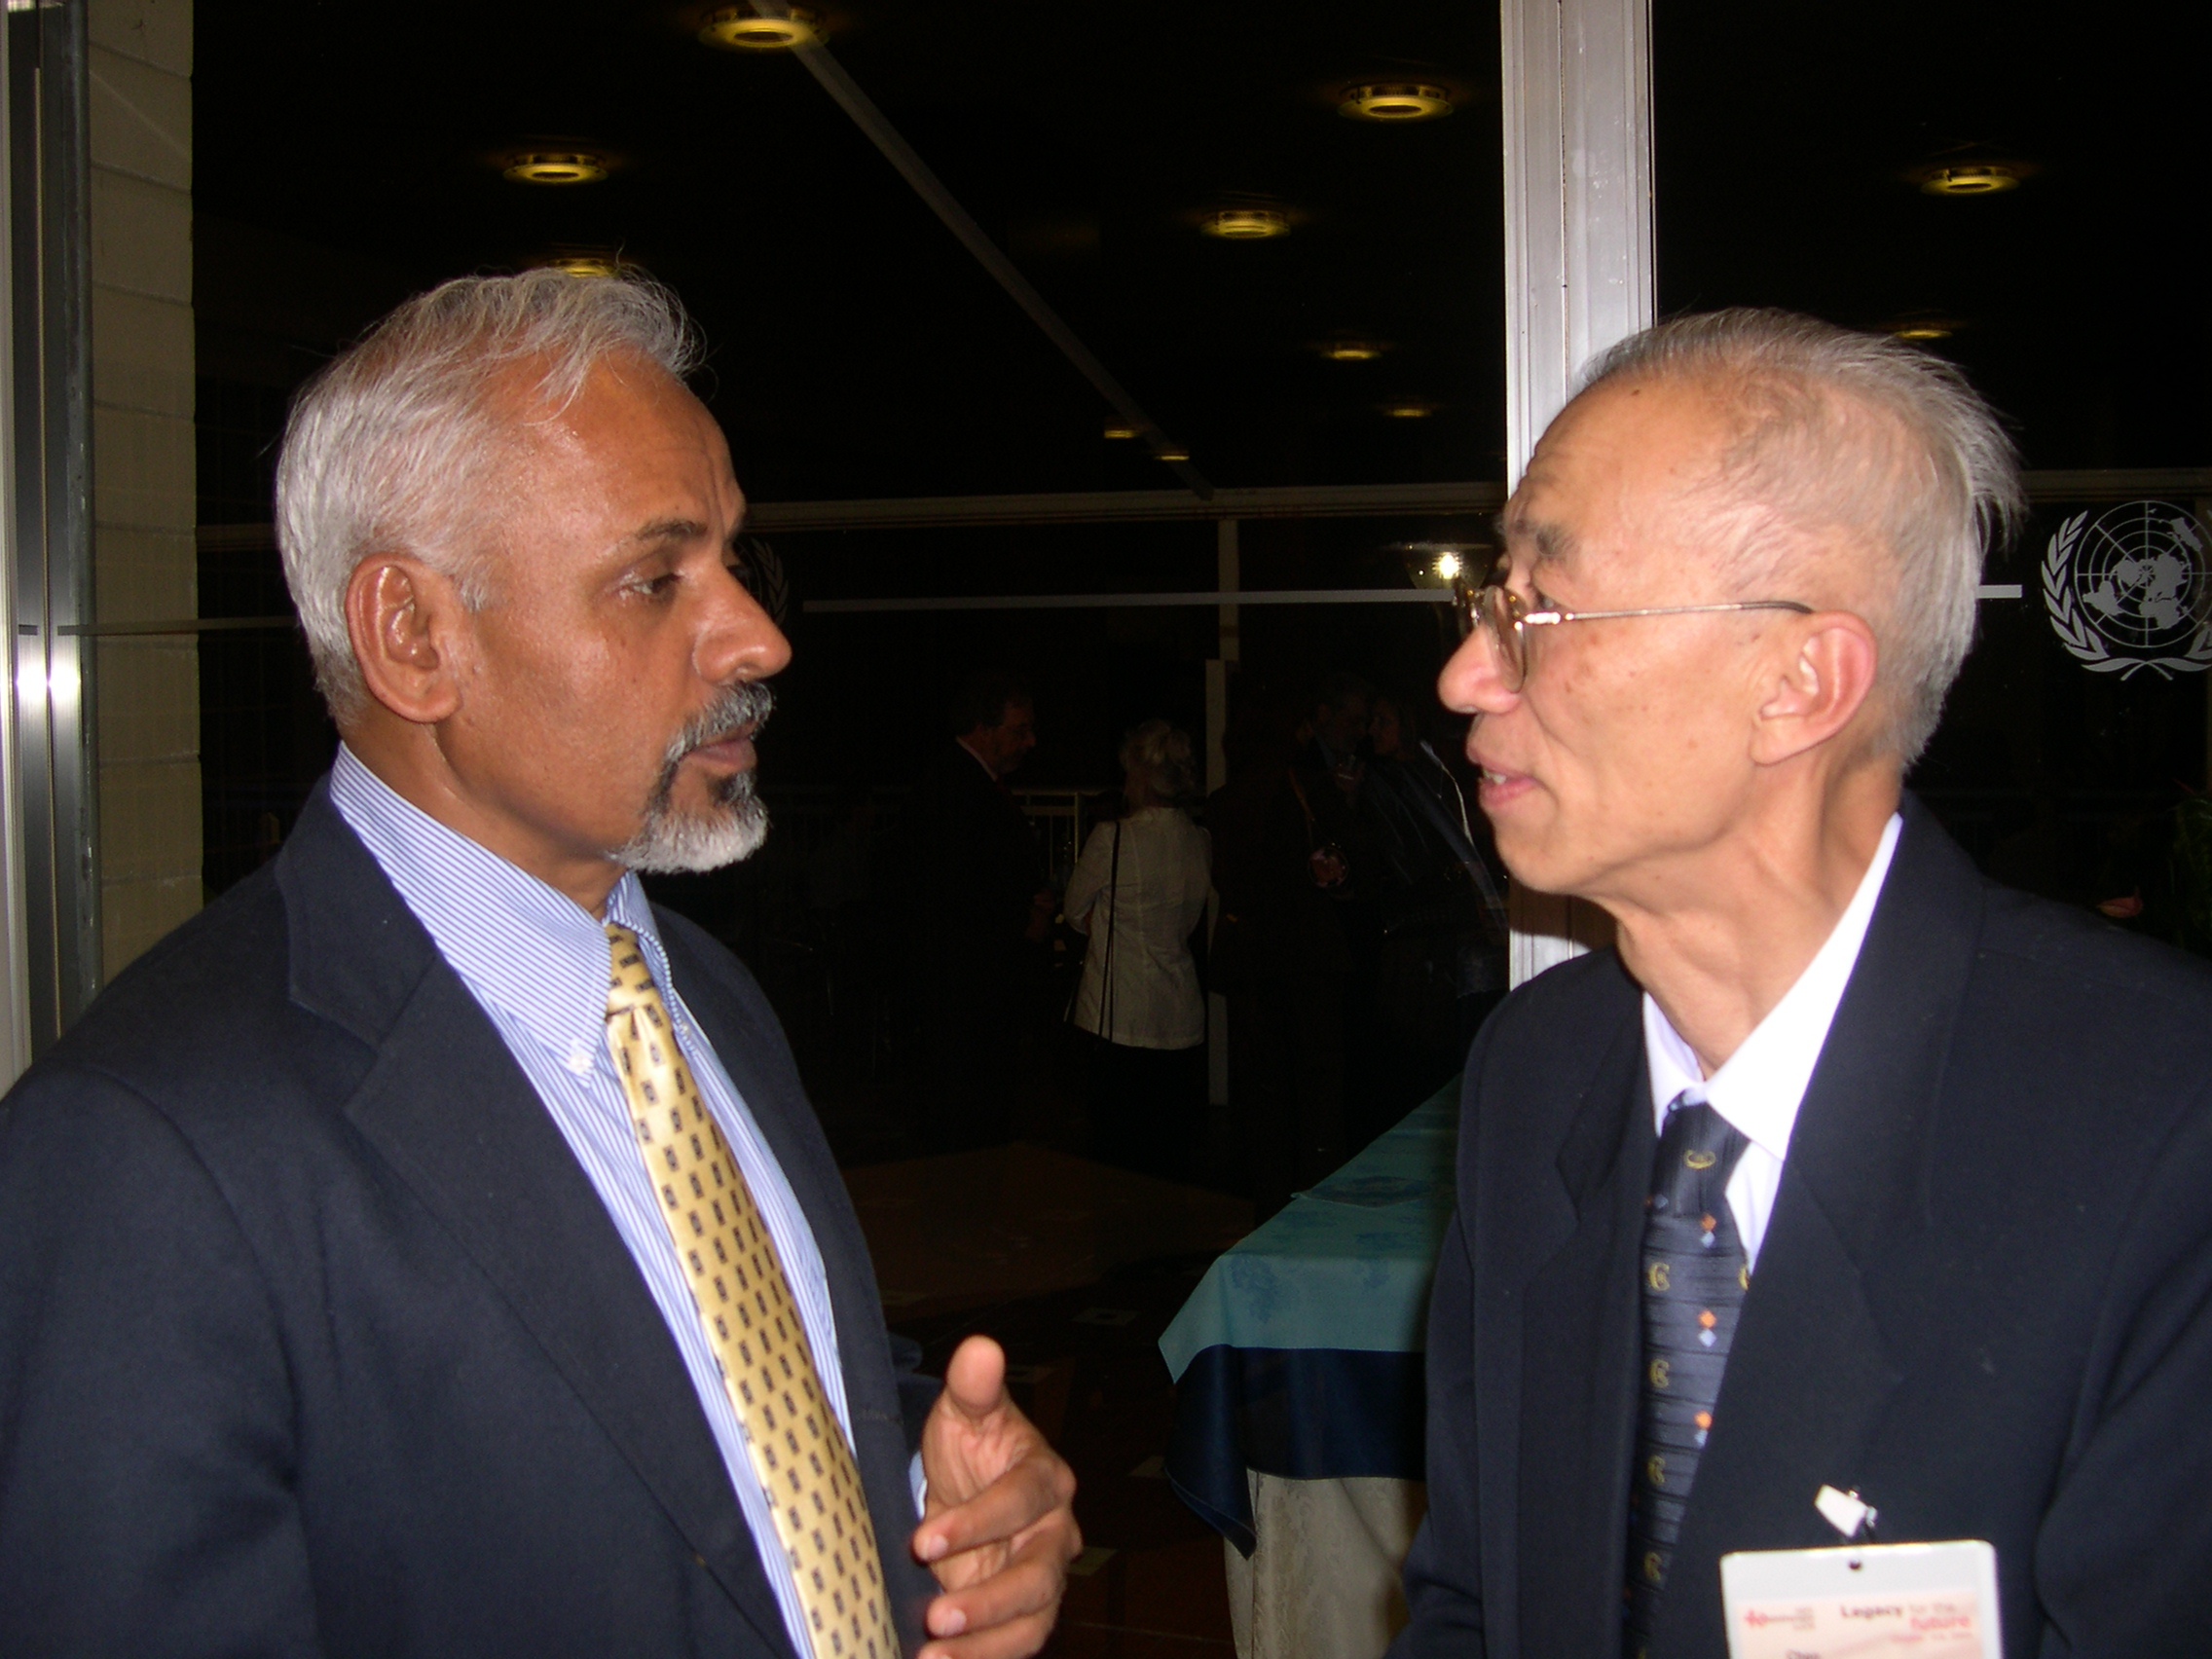 K.R. Sreenivasan and Jia-er Chen